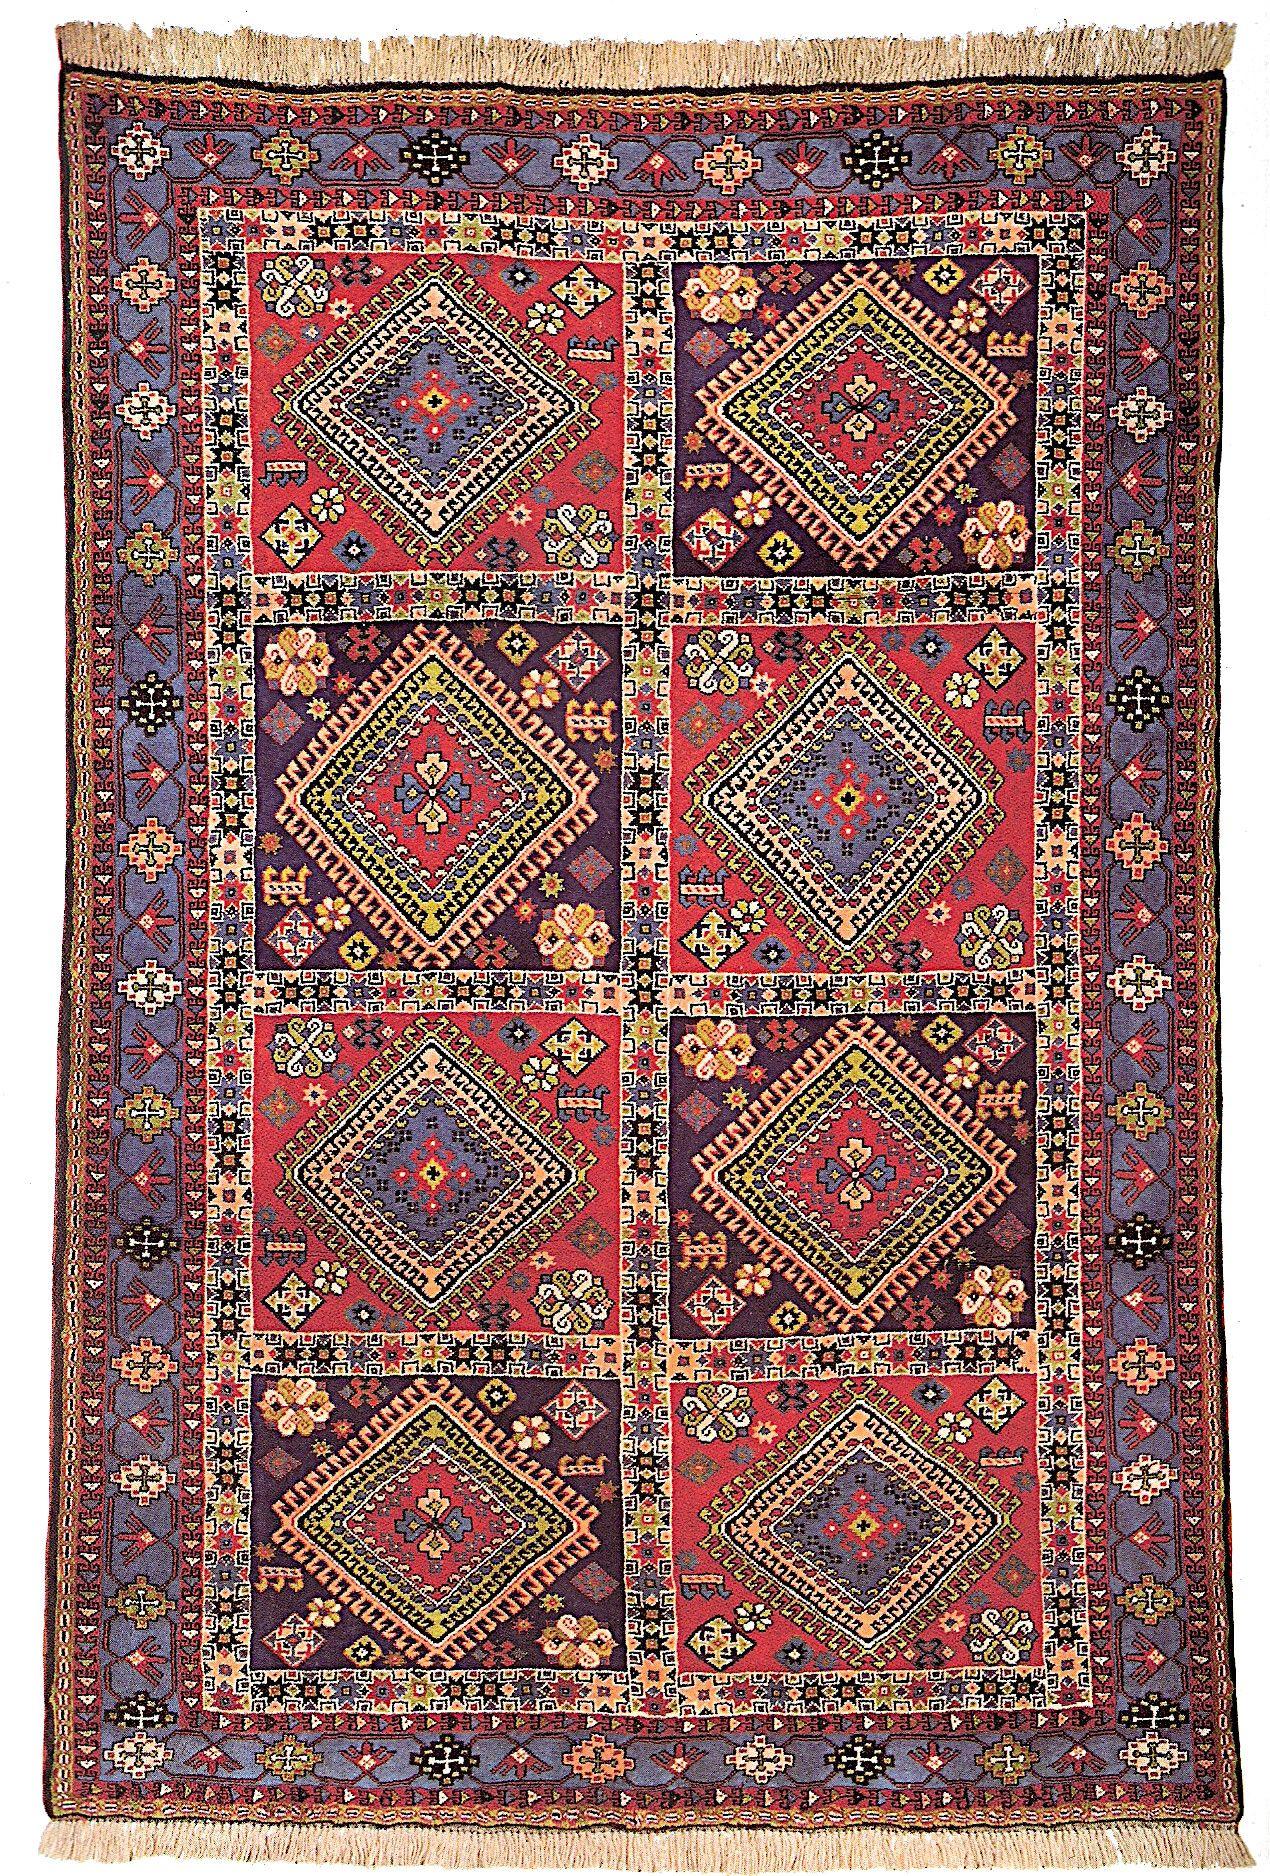 Yalame Talkhooncheh Iran 167x249 Tappeti persiani